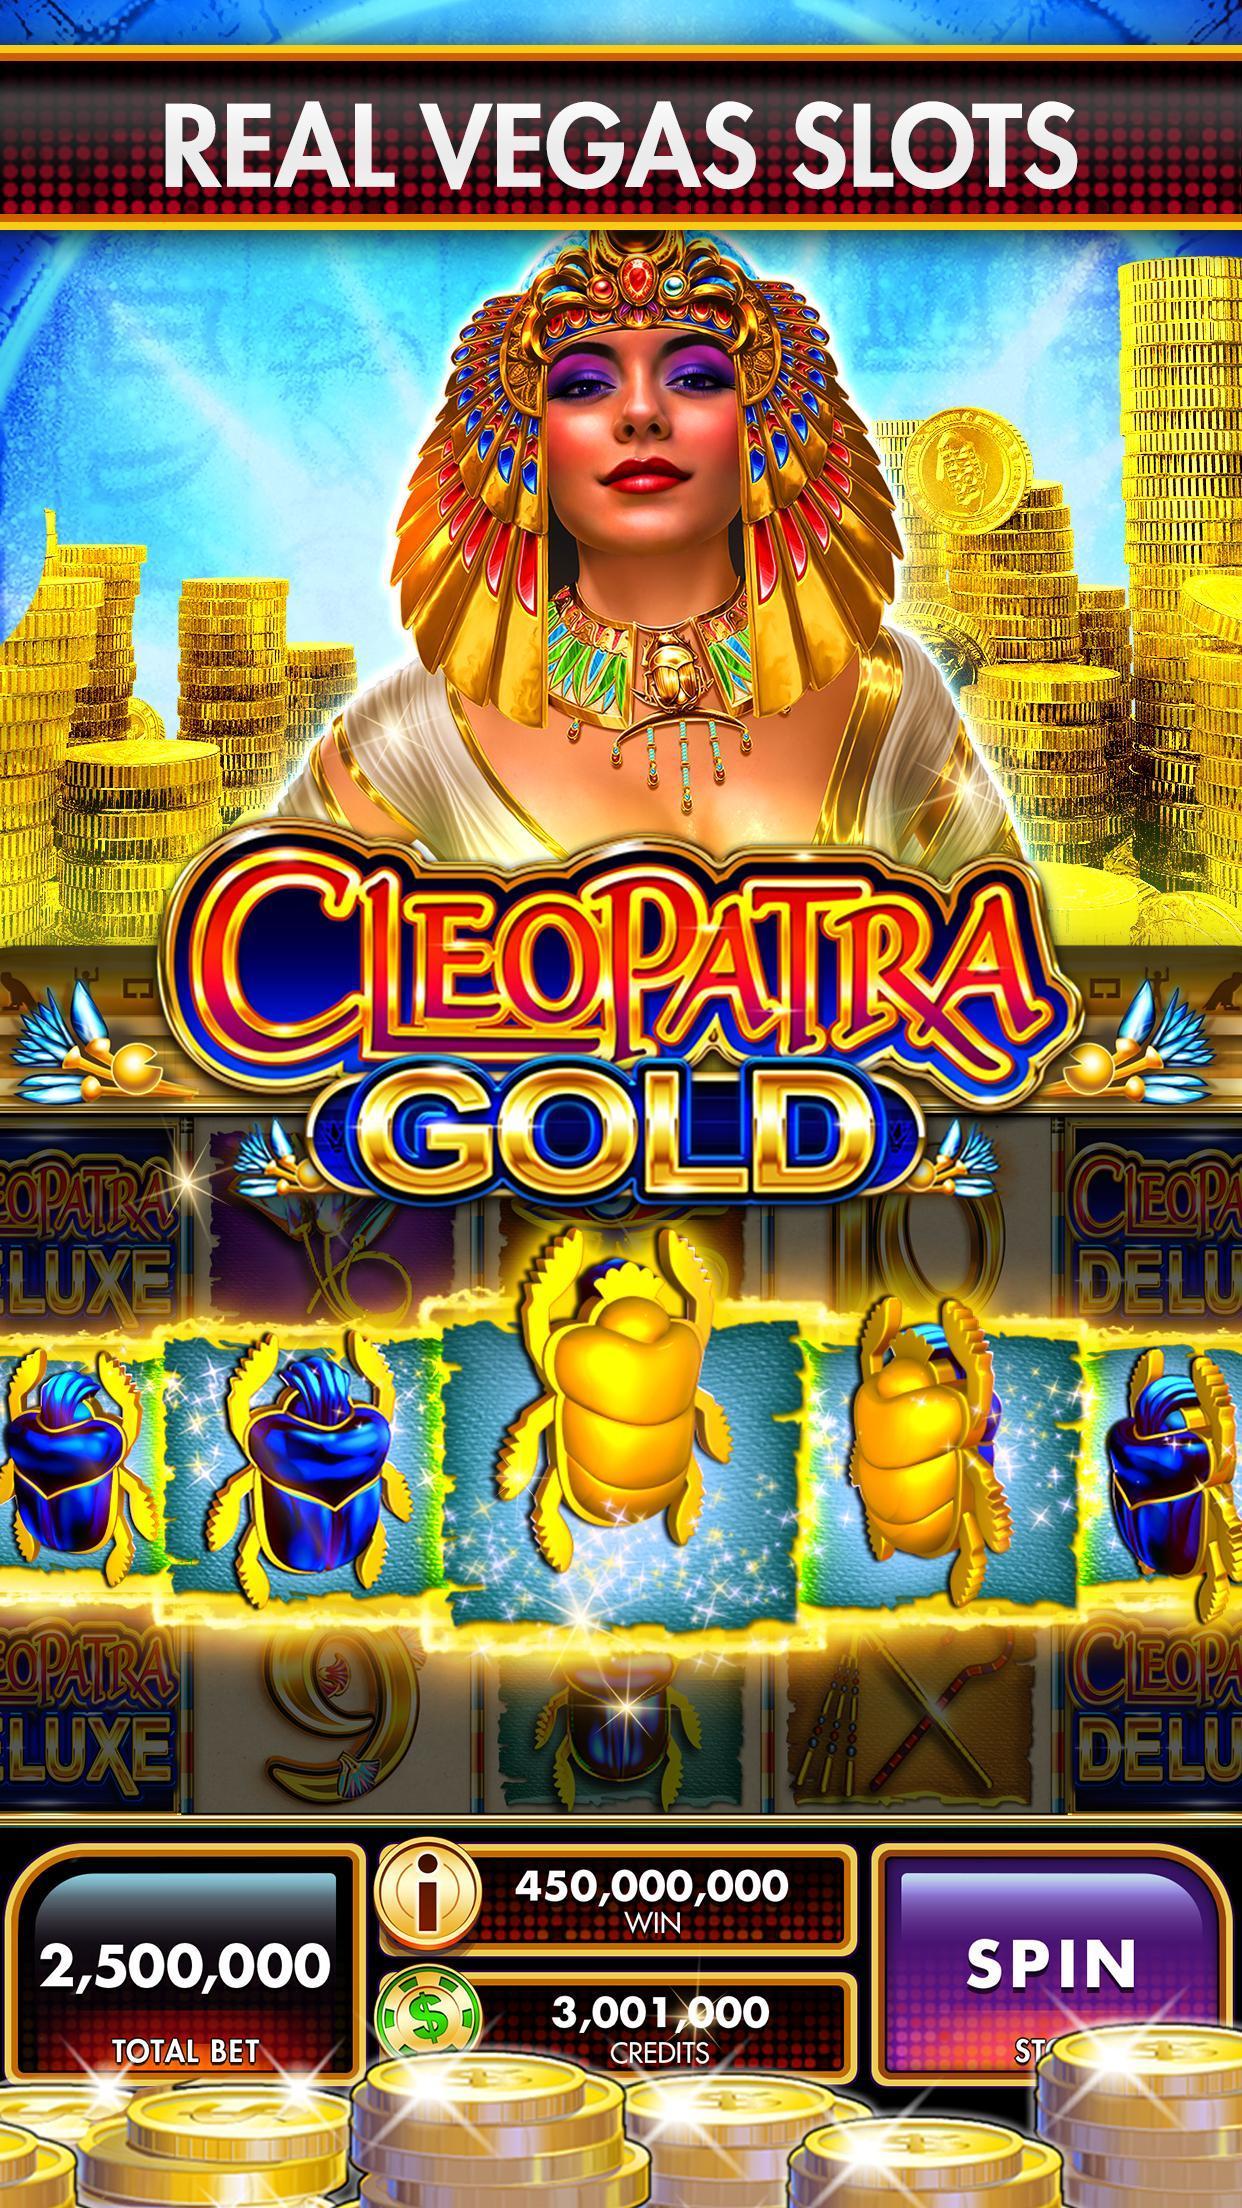 Casino Slots DoubleDown Fort Knox Free Vegas Games 1.26.7 Screenshot 17